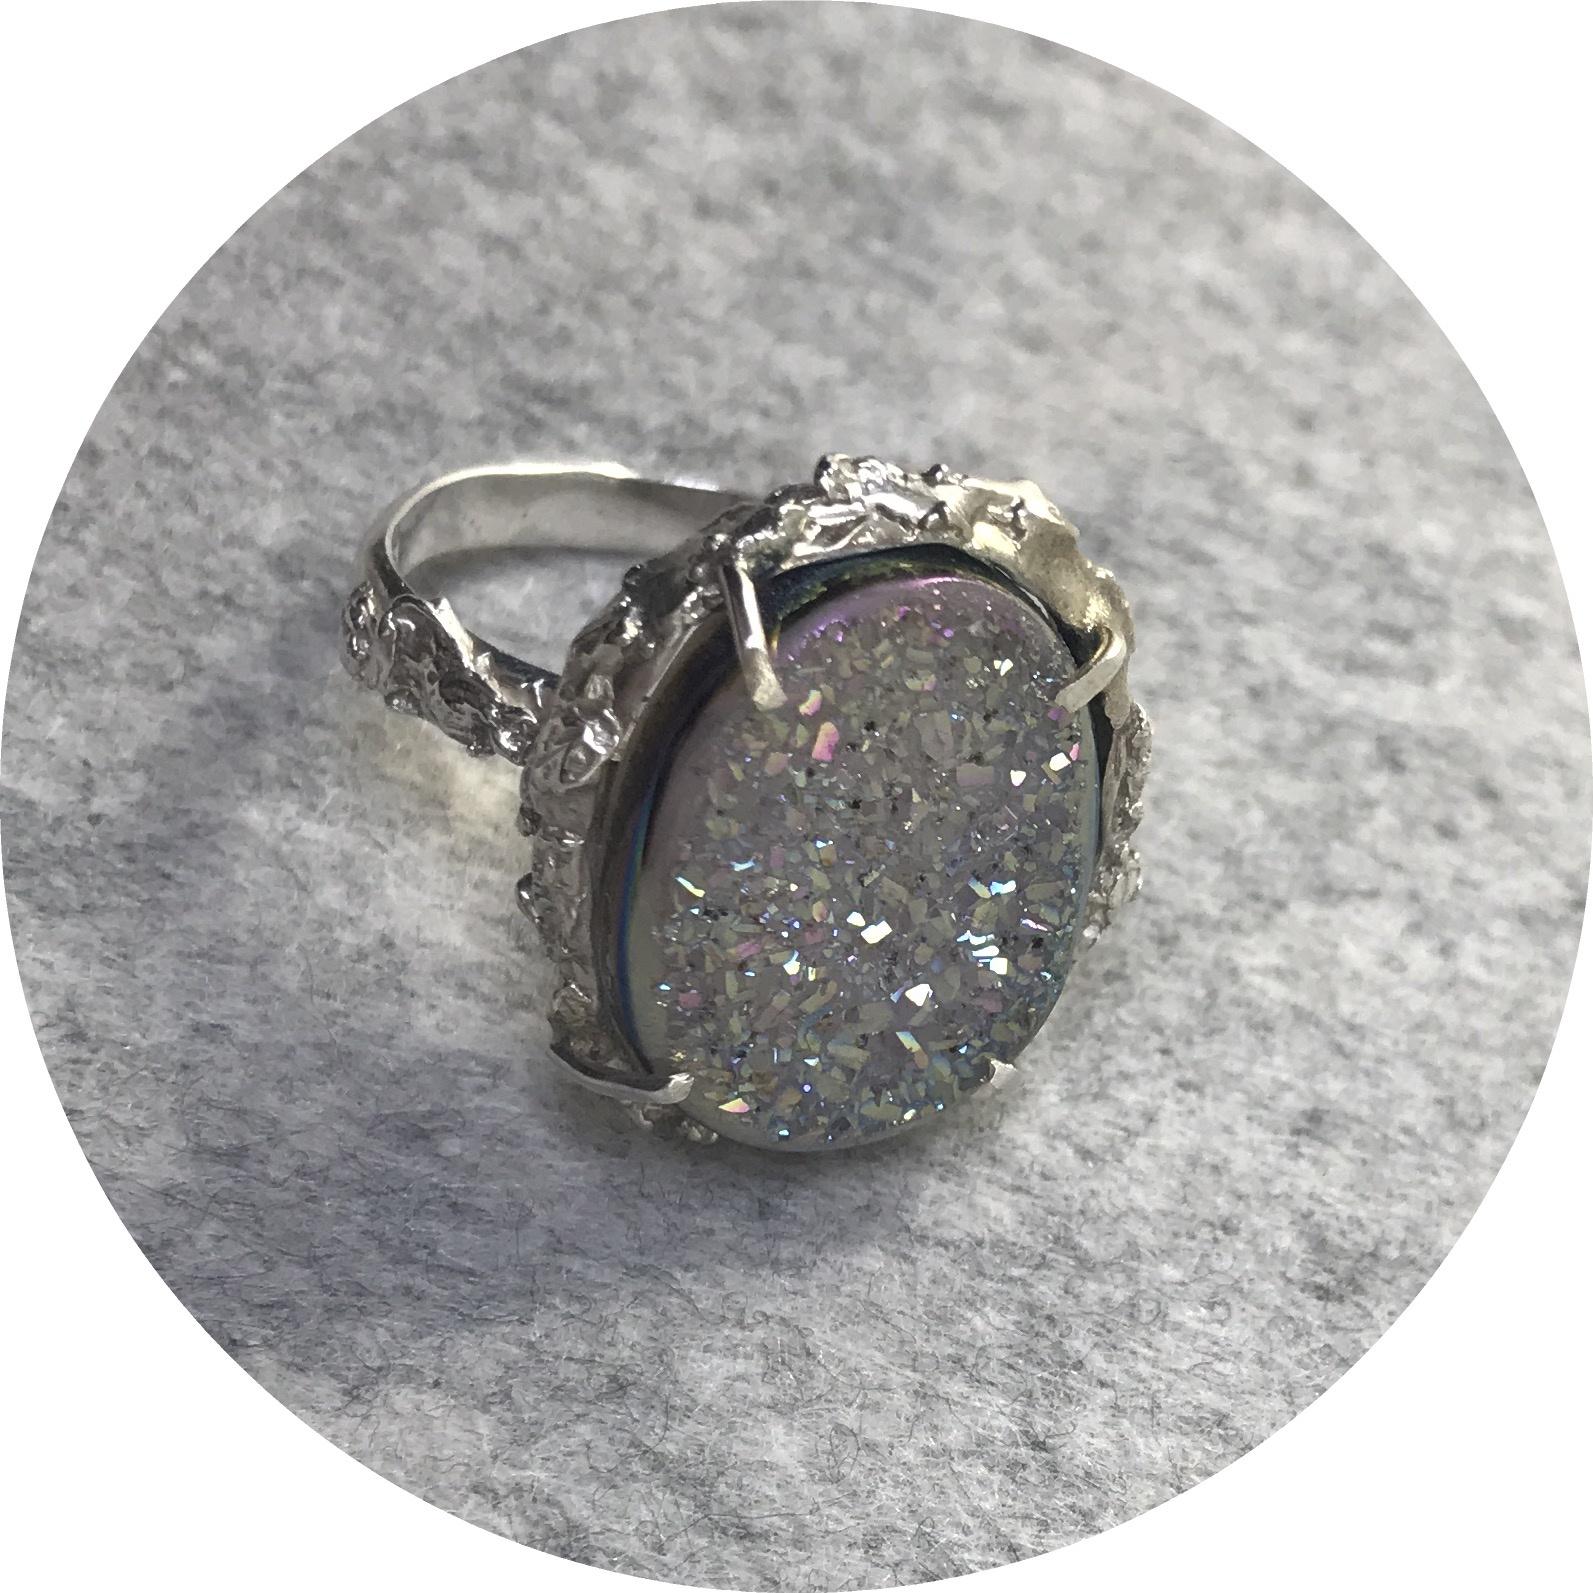 Lizzie Slattery- Druzy Ring II. Sterling silver and Druzy Quartz. size P